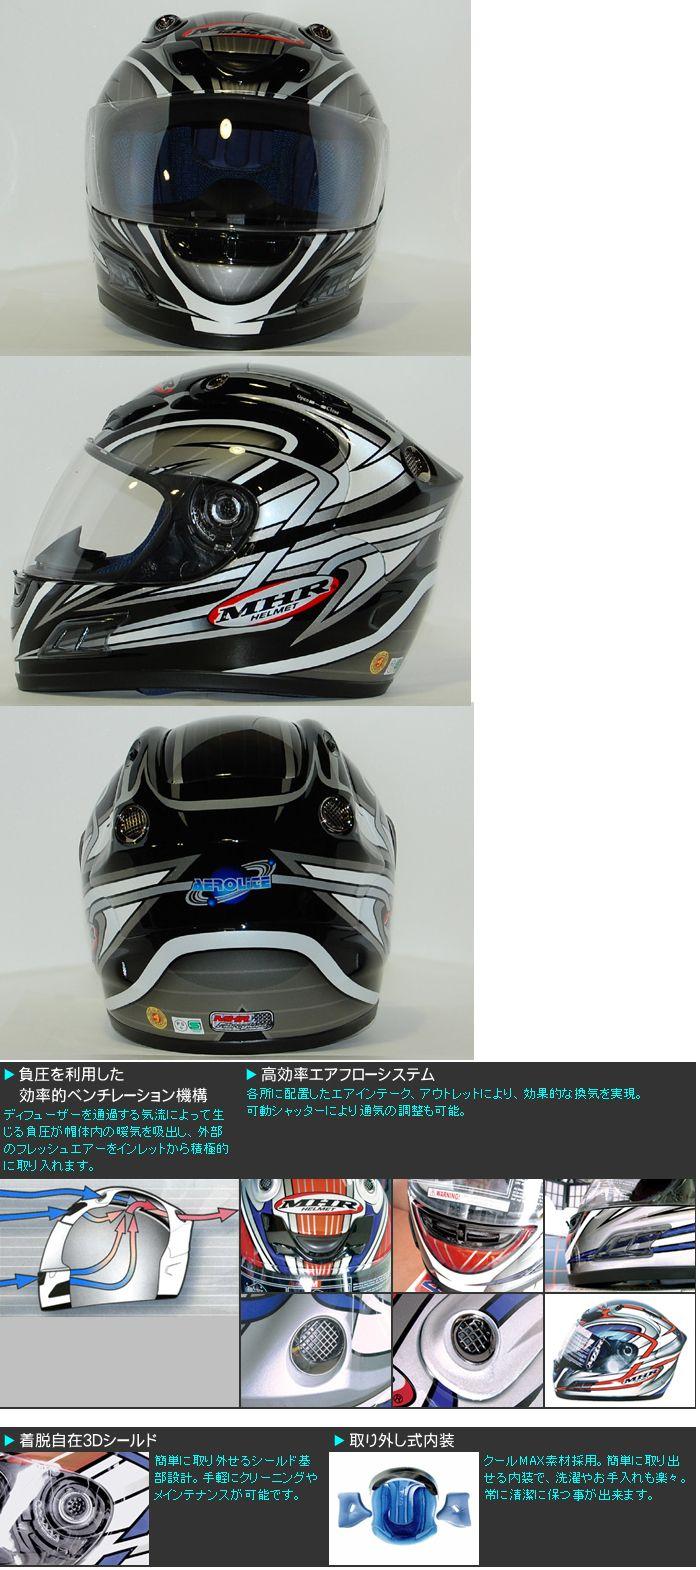 【MHR】TOP Series安全帽 - 「Webike-摩托百貨」